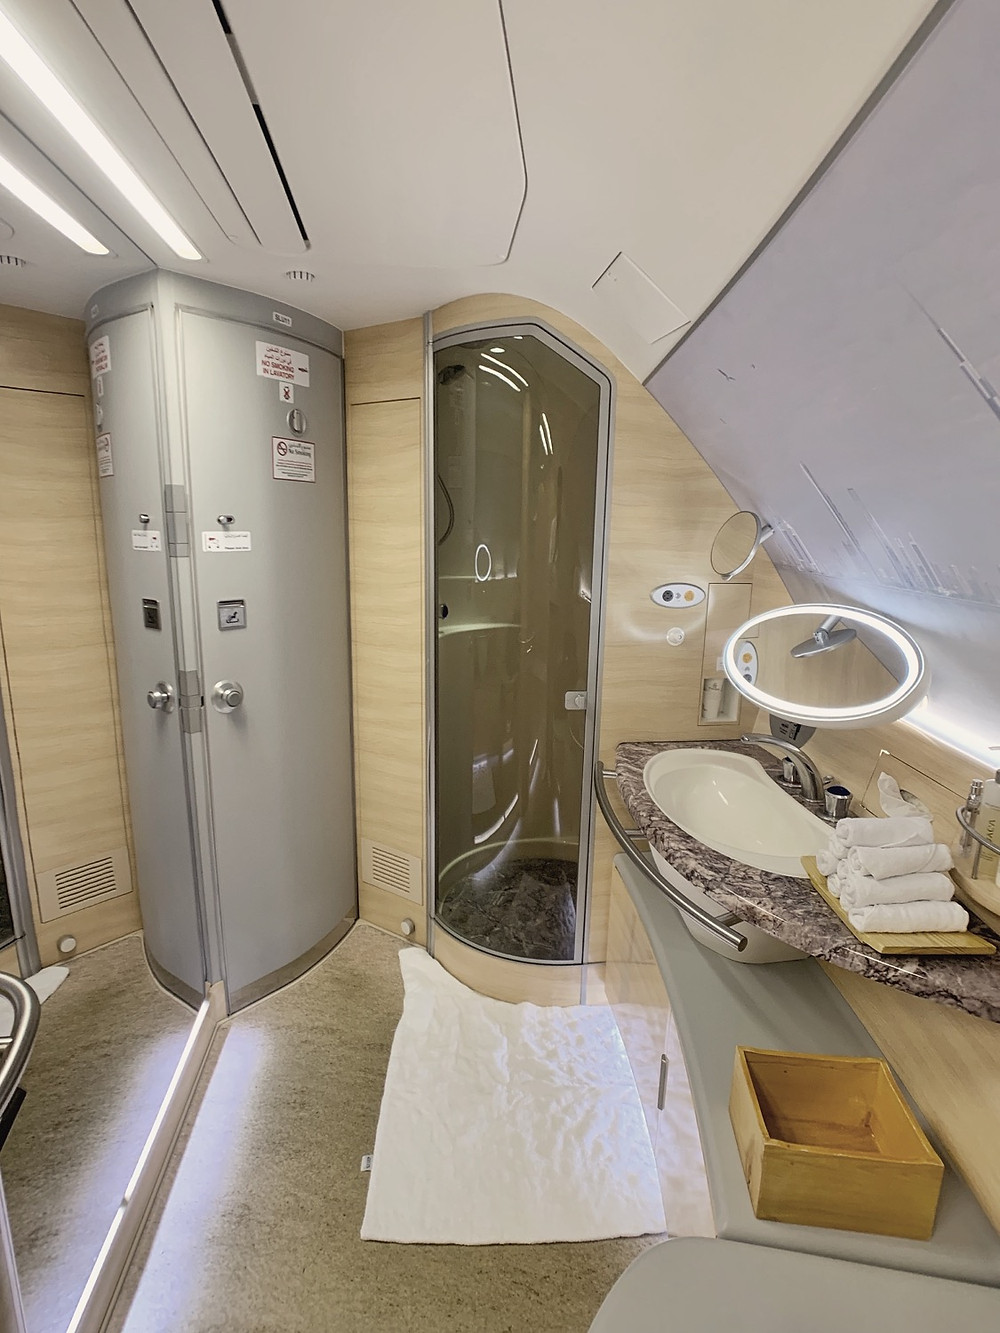 Emirates First Class San Francisco - Dubai, A380 Lavatory & Shower Spa